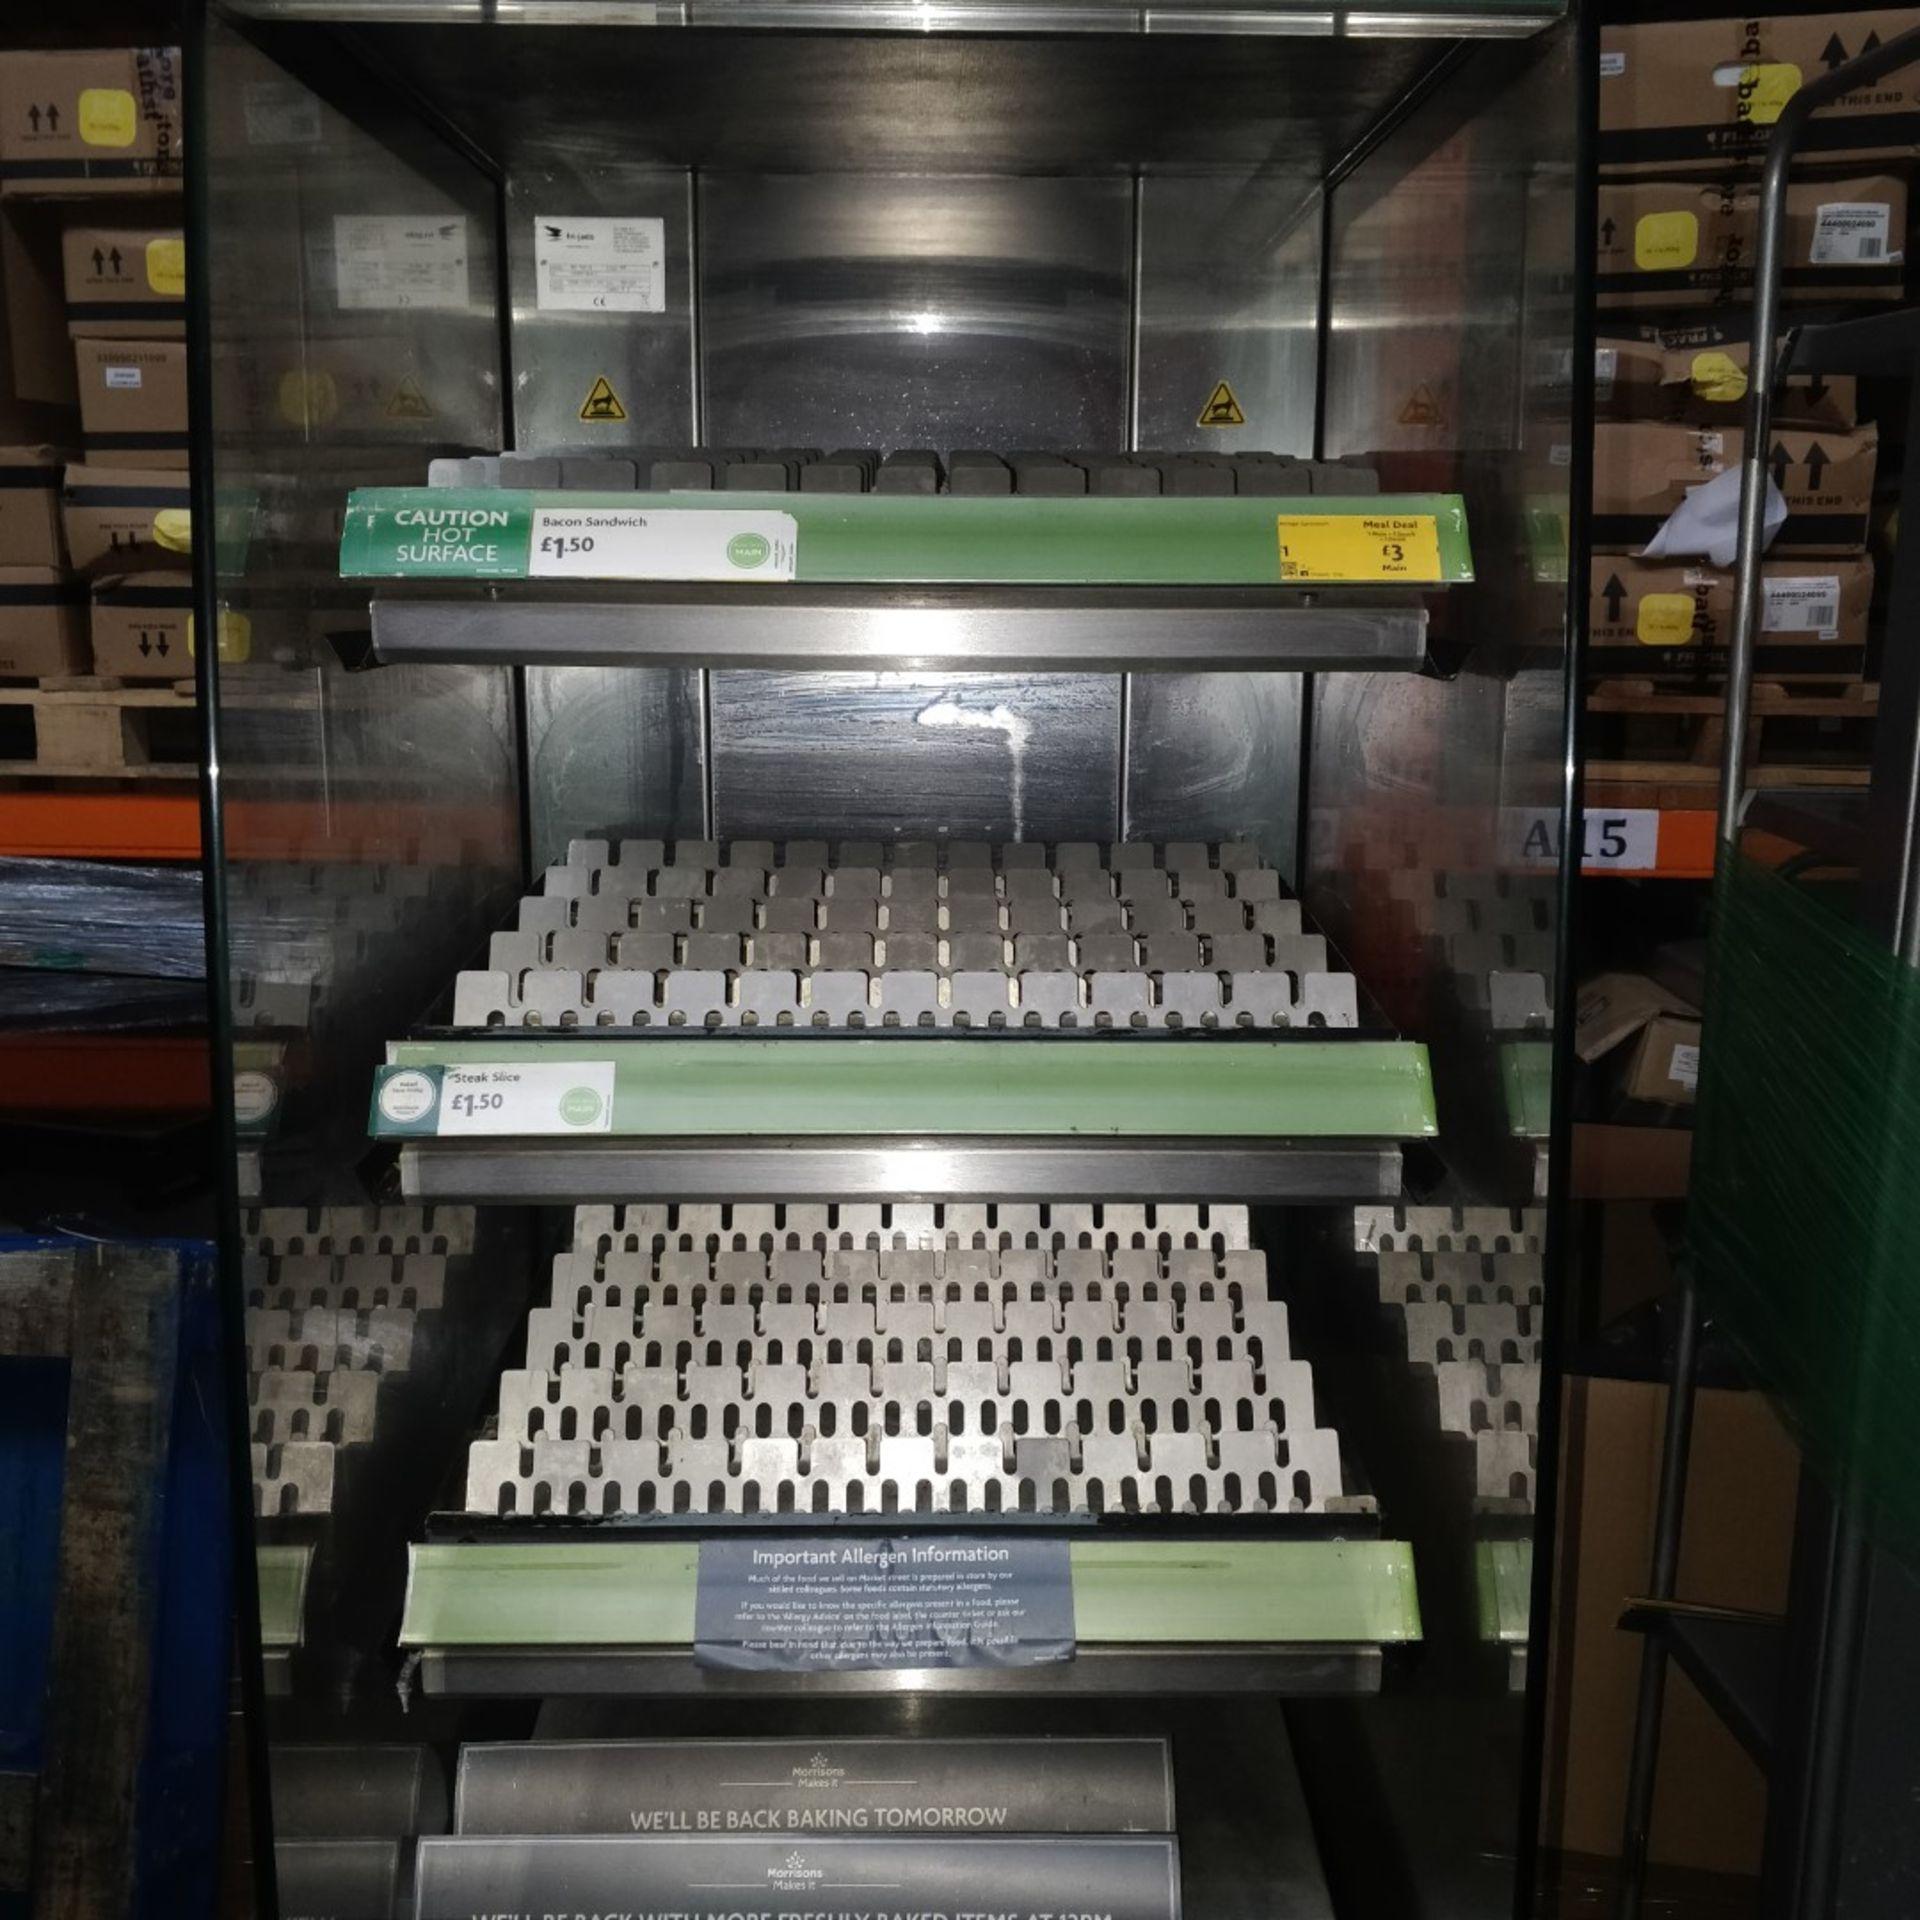 1 x Frijado Multi Deck 60 5 Level Heated Grab and Go Display Warmer - 400v 3 Phase - H197 x W60 x - Image 10 of 11